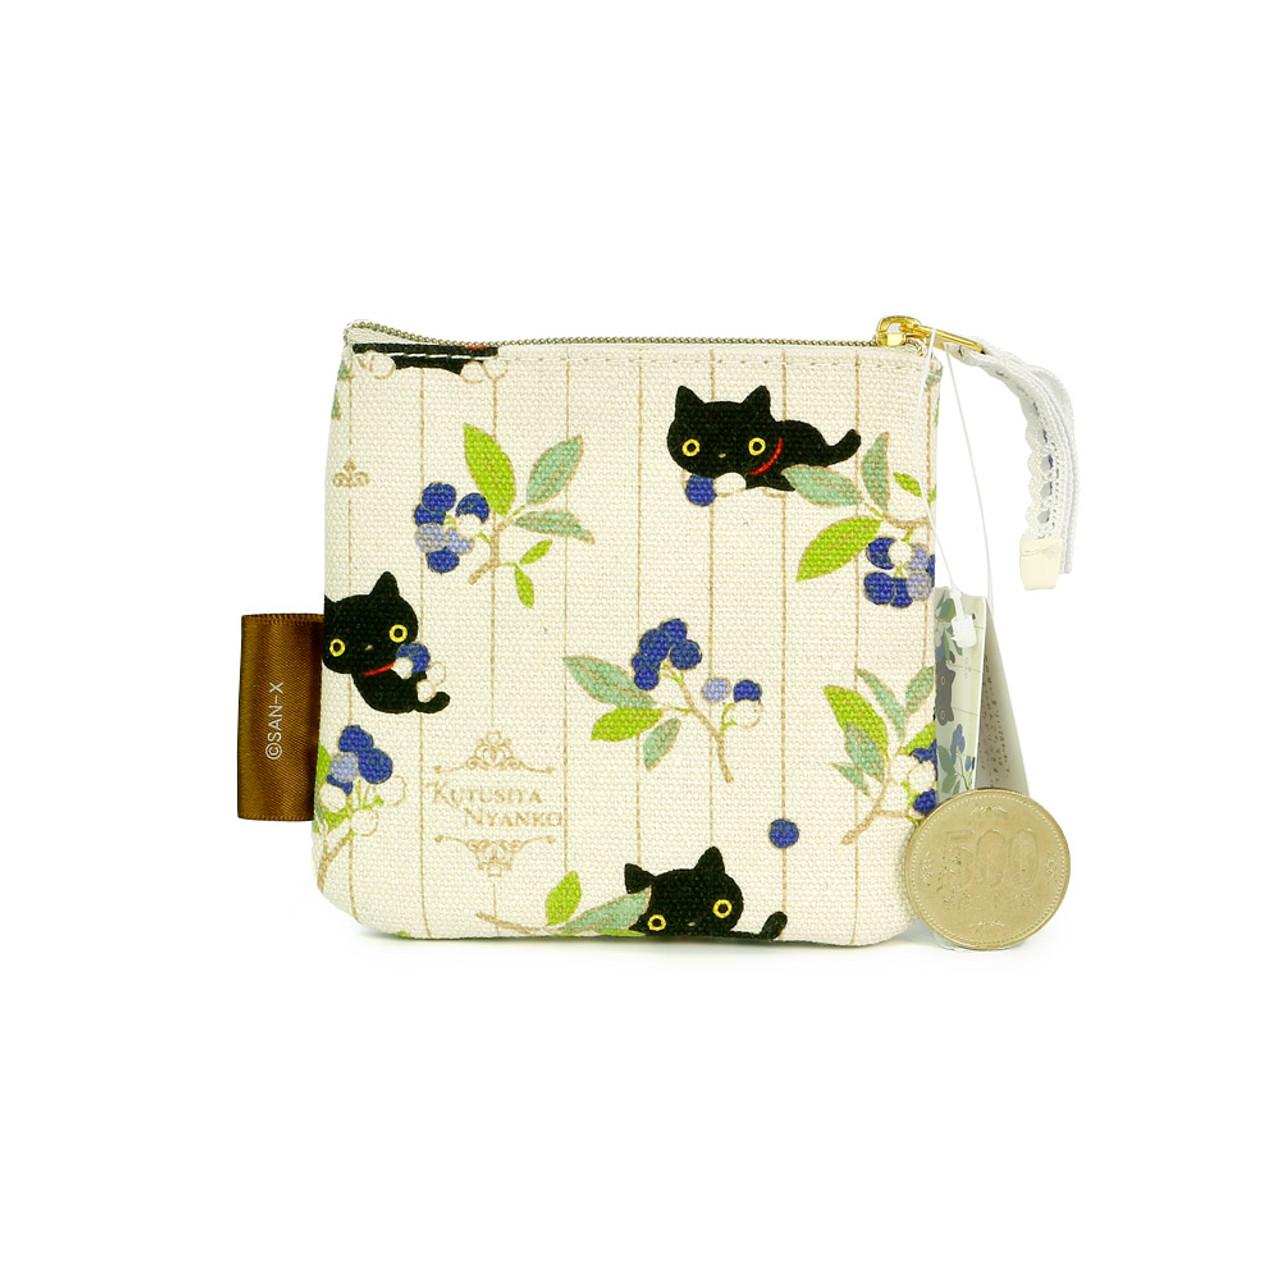 0c57f996d95 San-X Kutusita Nyanko Socks Black Cat English Garden Canvas Fabric Coin  Wallet ( Front